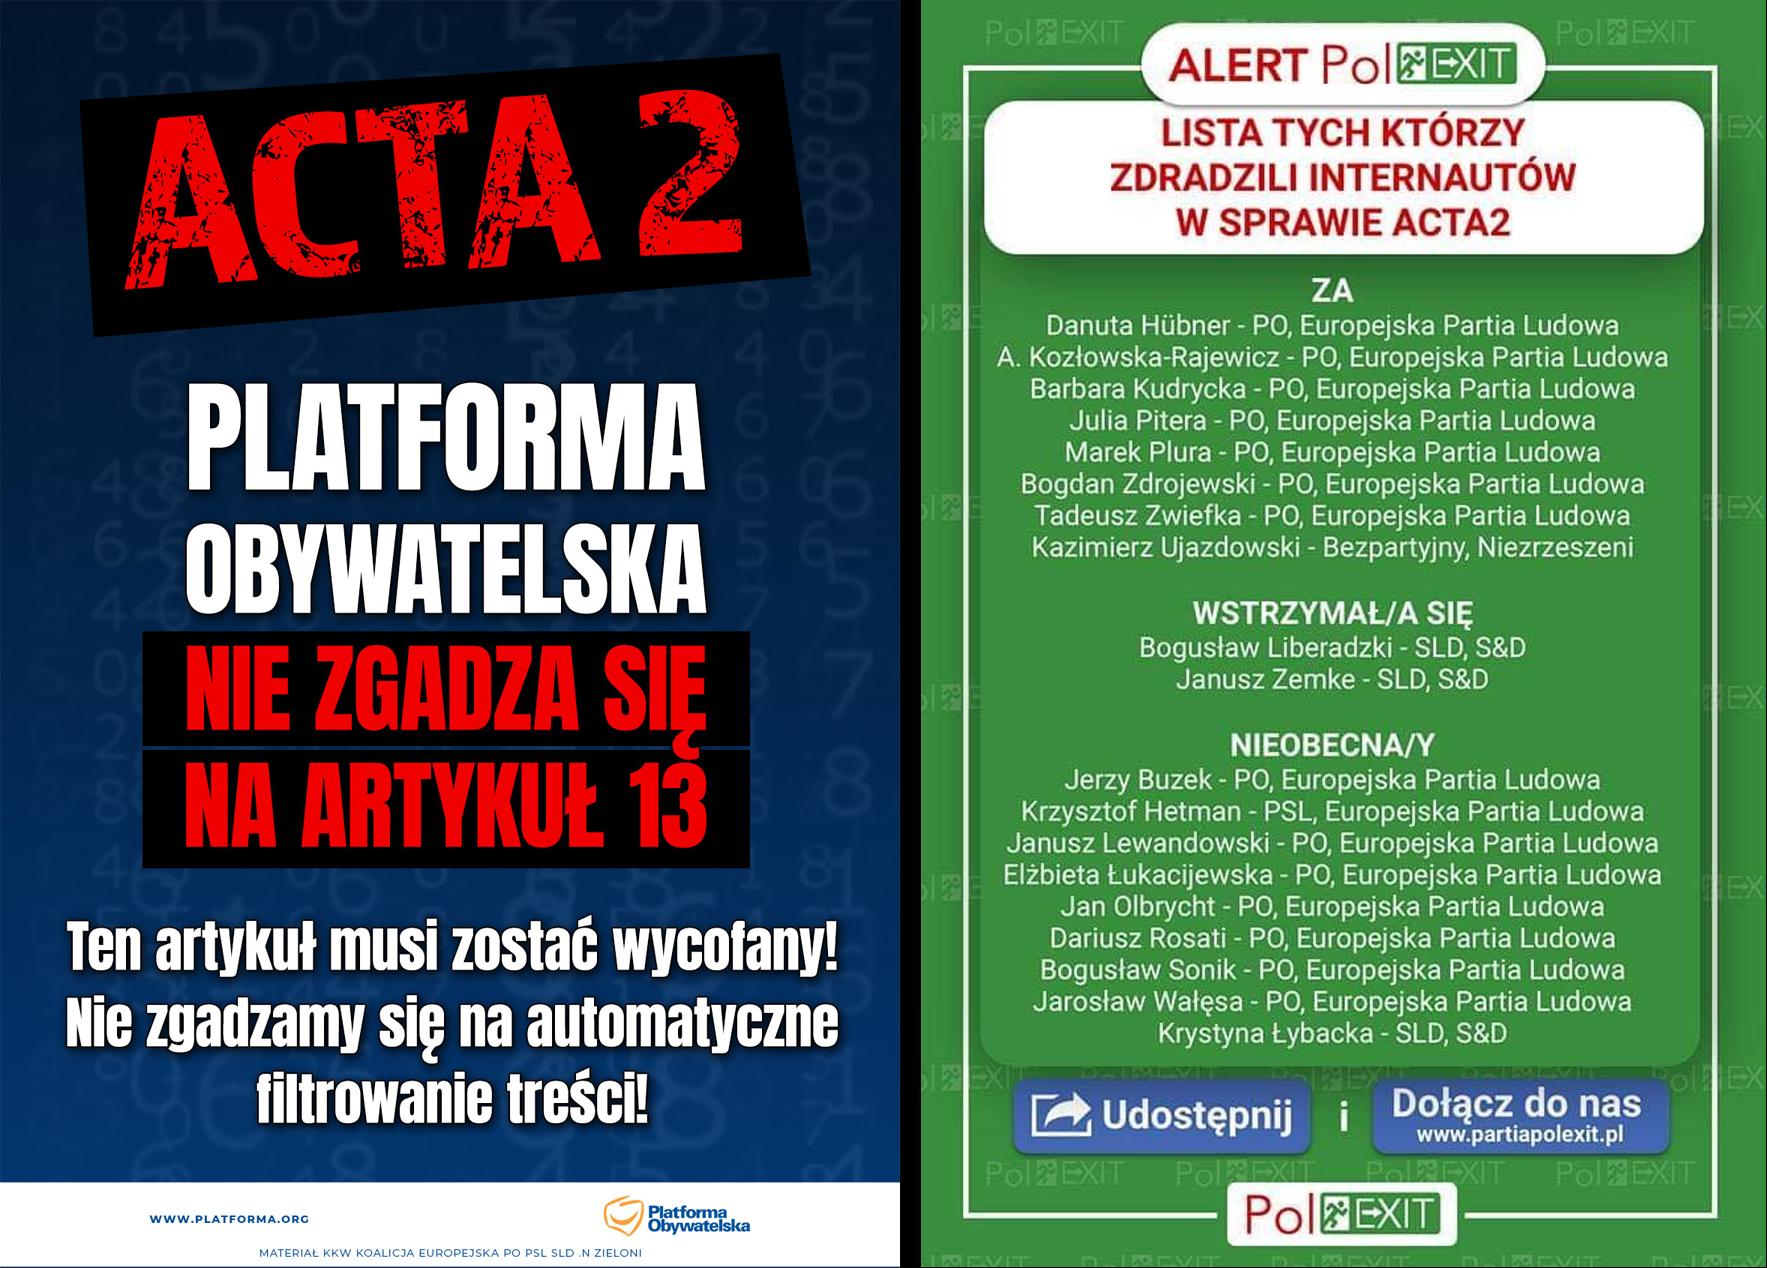 acta2-kto-jak-glosowal-platforma-obywatelska-parlament-europejski